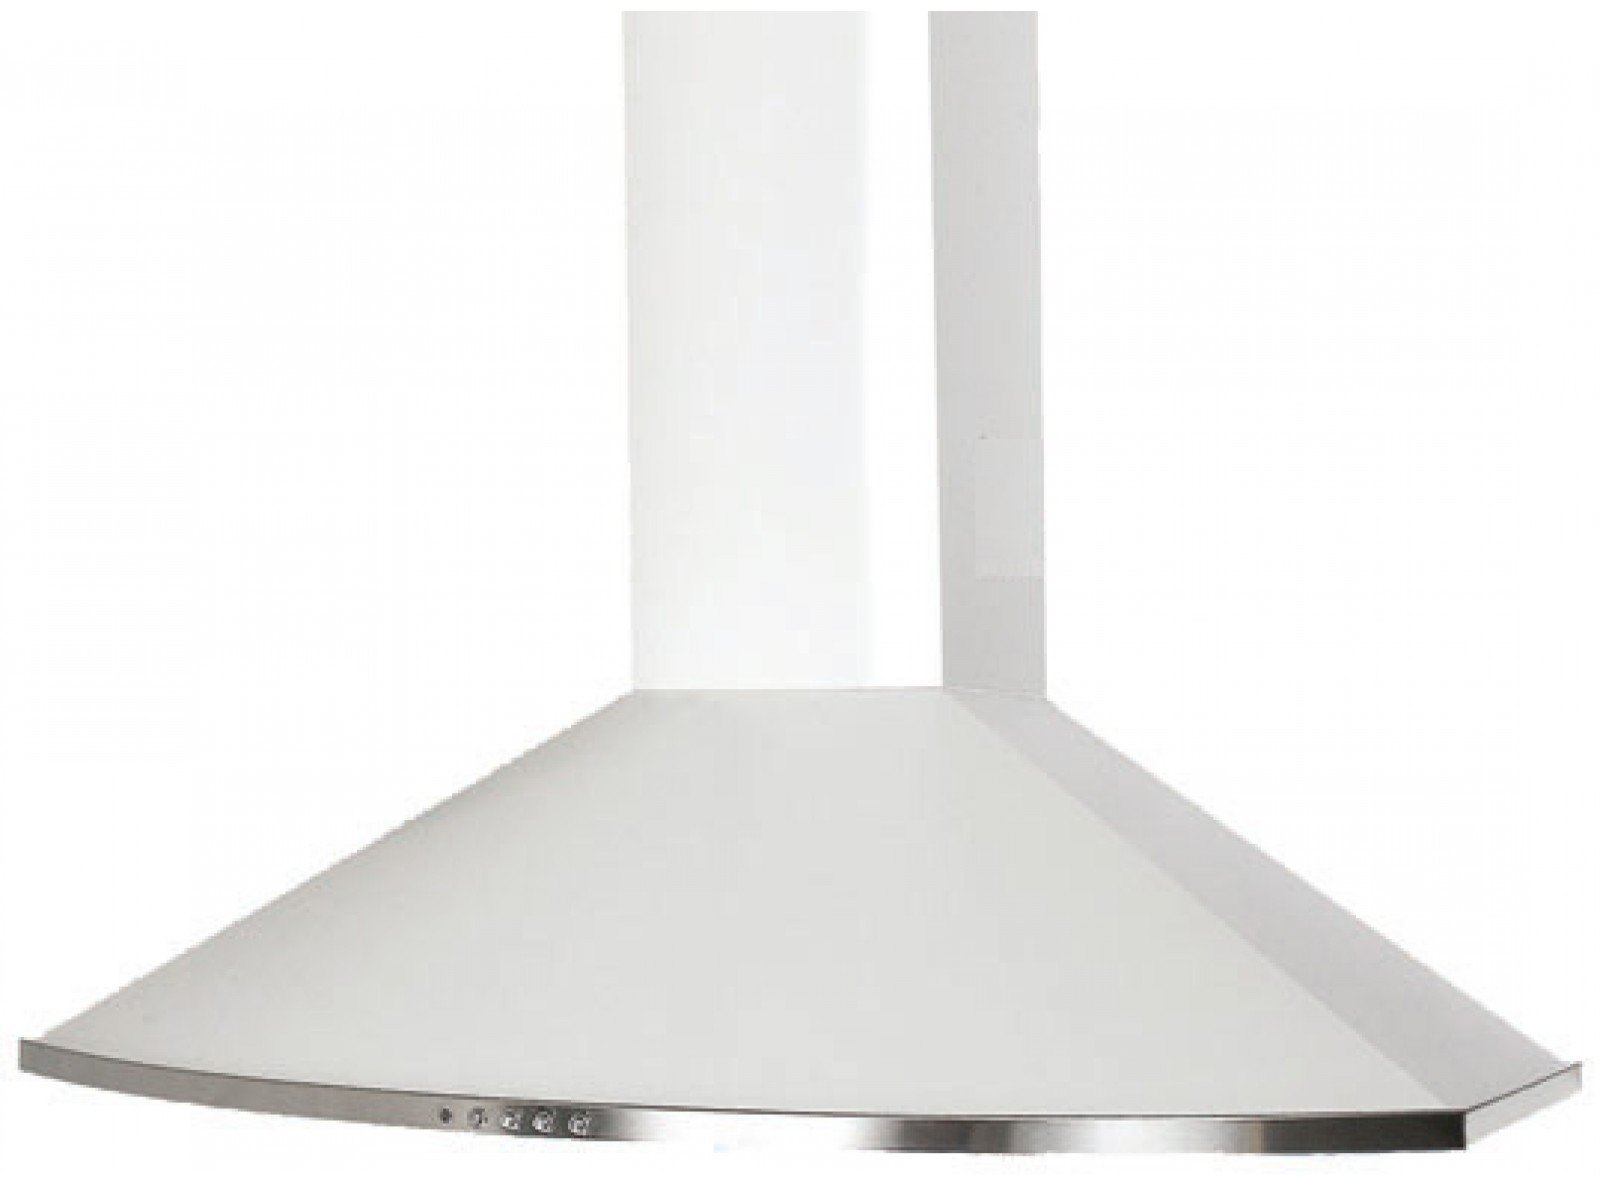 Liesikupu Franke Tender 725 A,C 90 cm valkoinen POISTO halogeenivaloilla  Ta